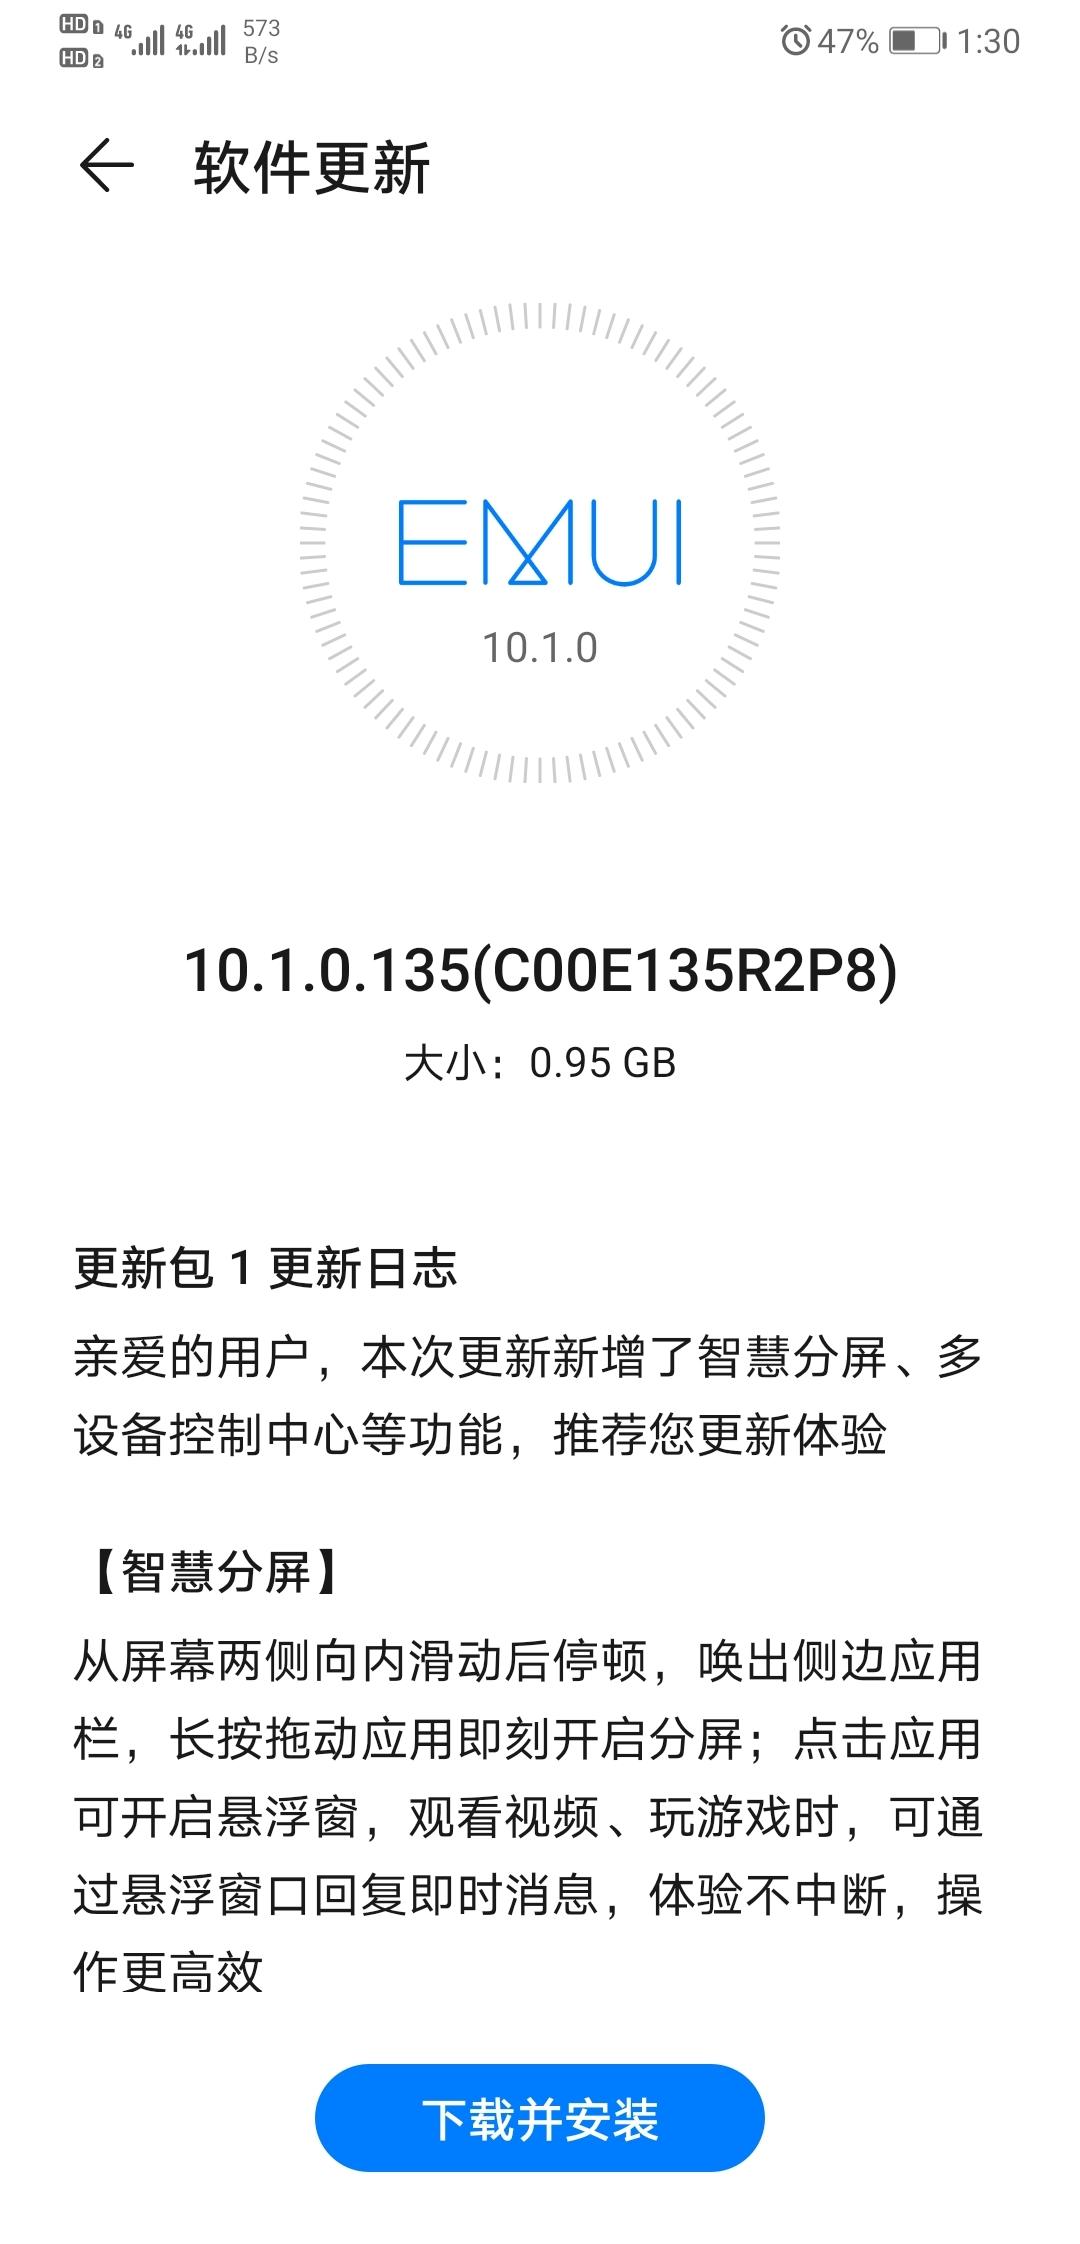 Screenshot_20200514_133038_com.huawei.android.hwouc.jpg